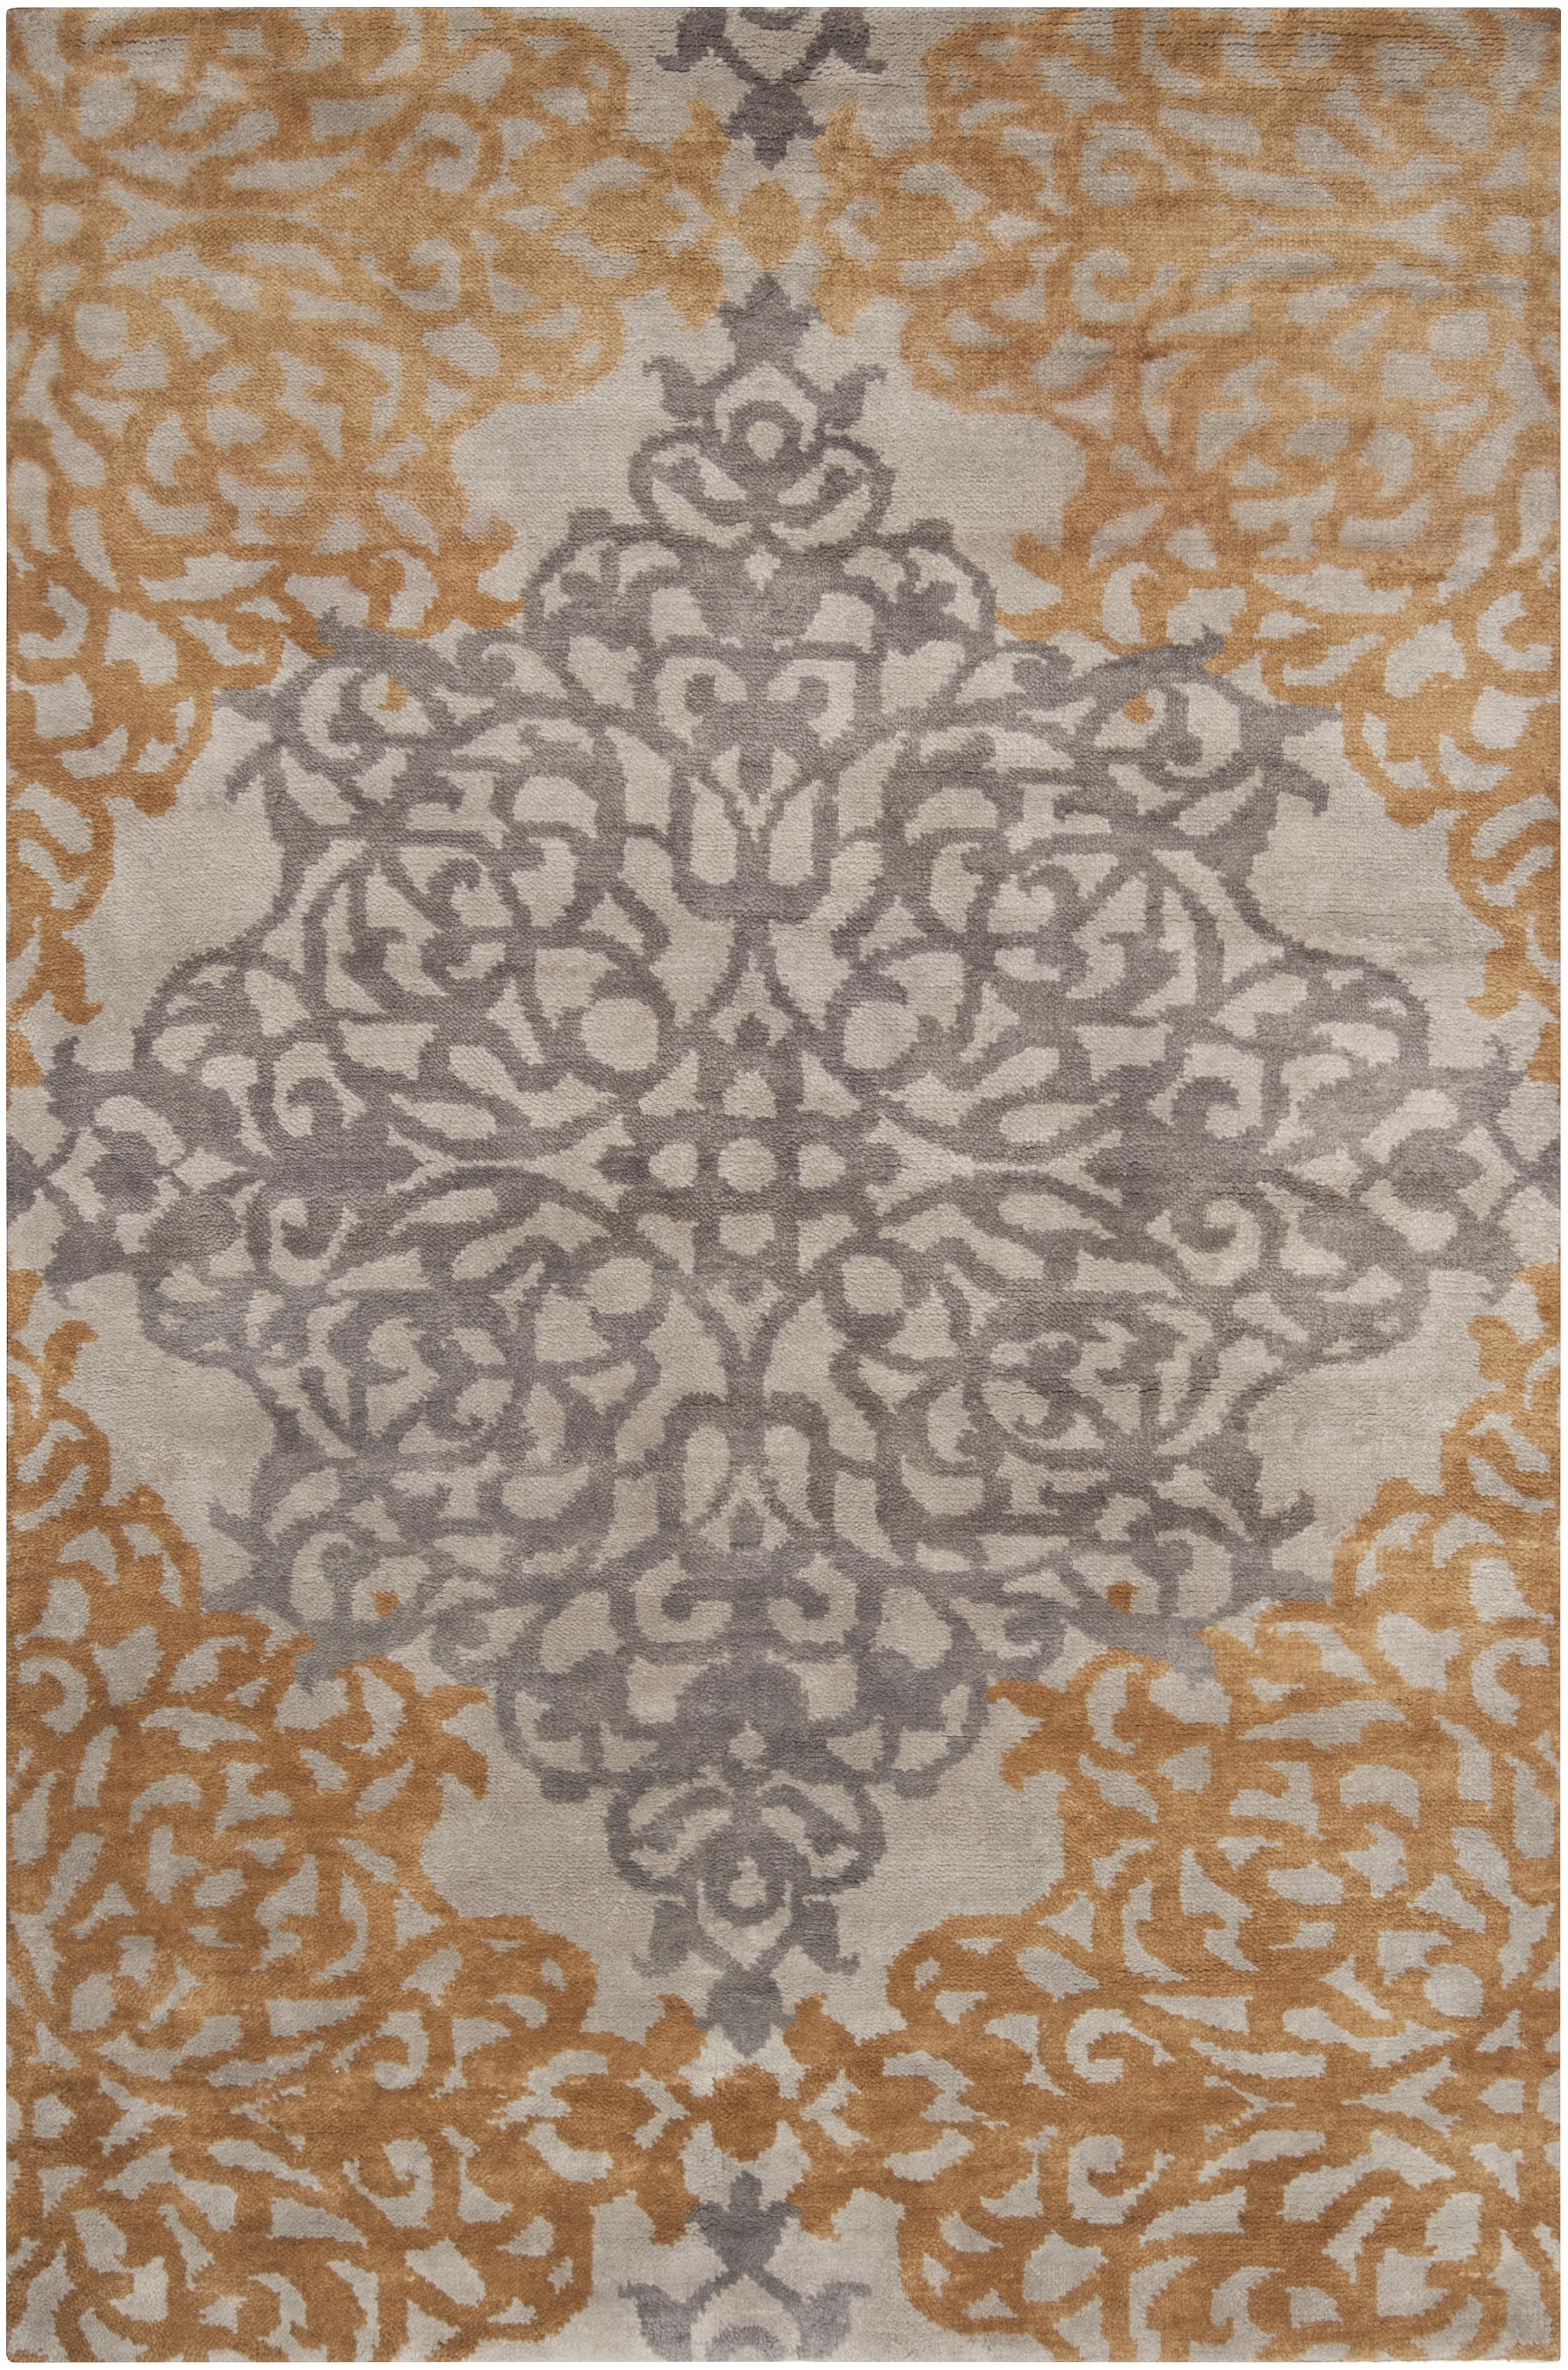 Surya Rugs Caspian 8' x 11' - Item Number: CAS9914-811